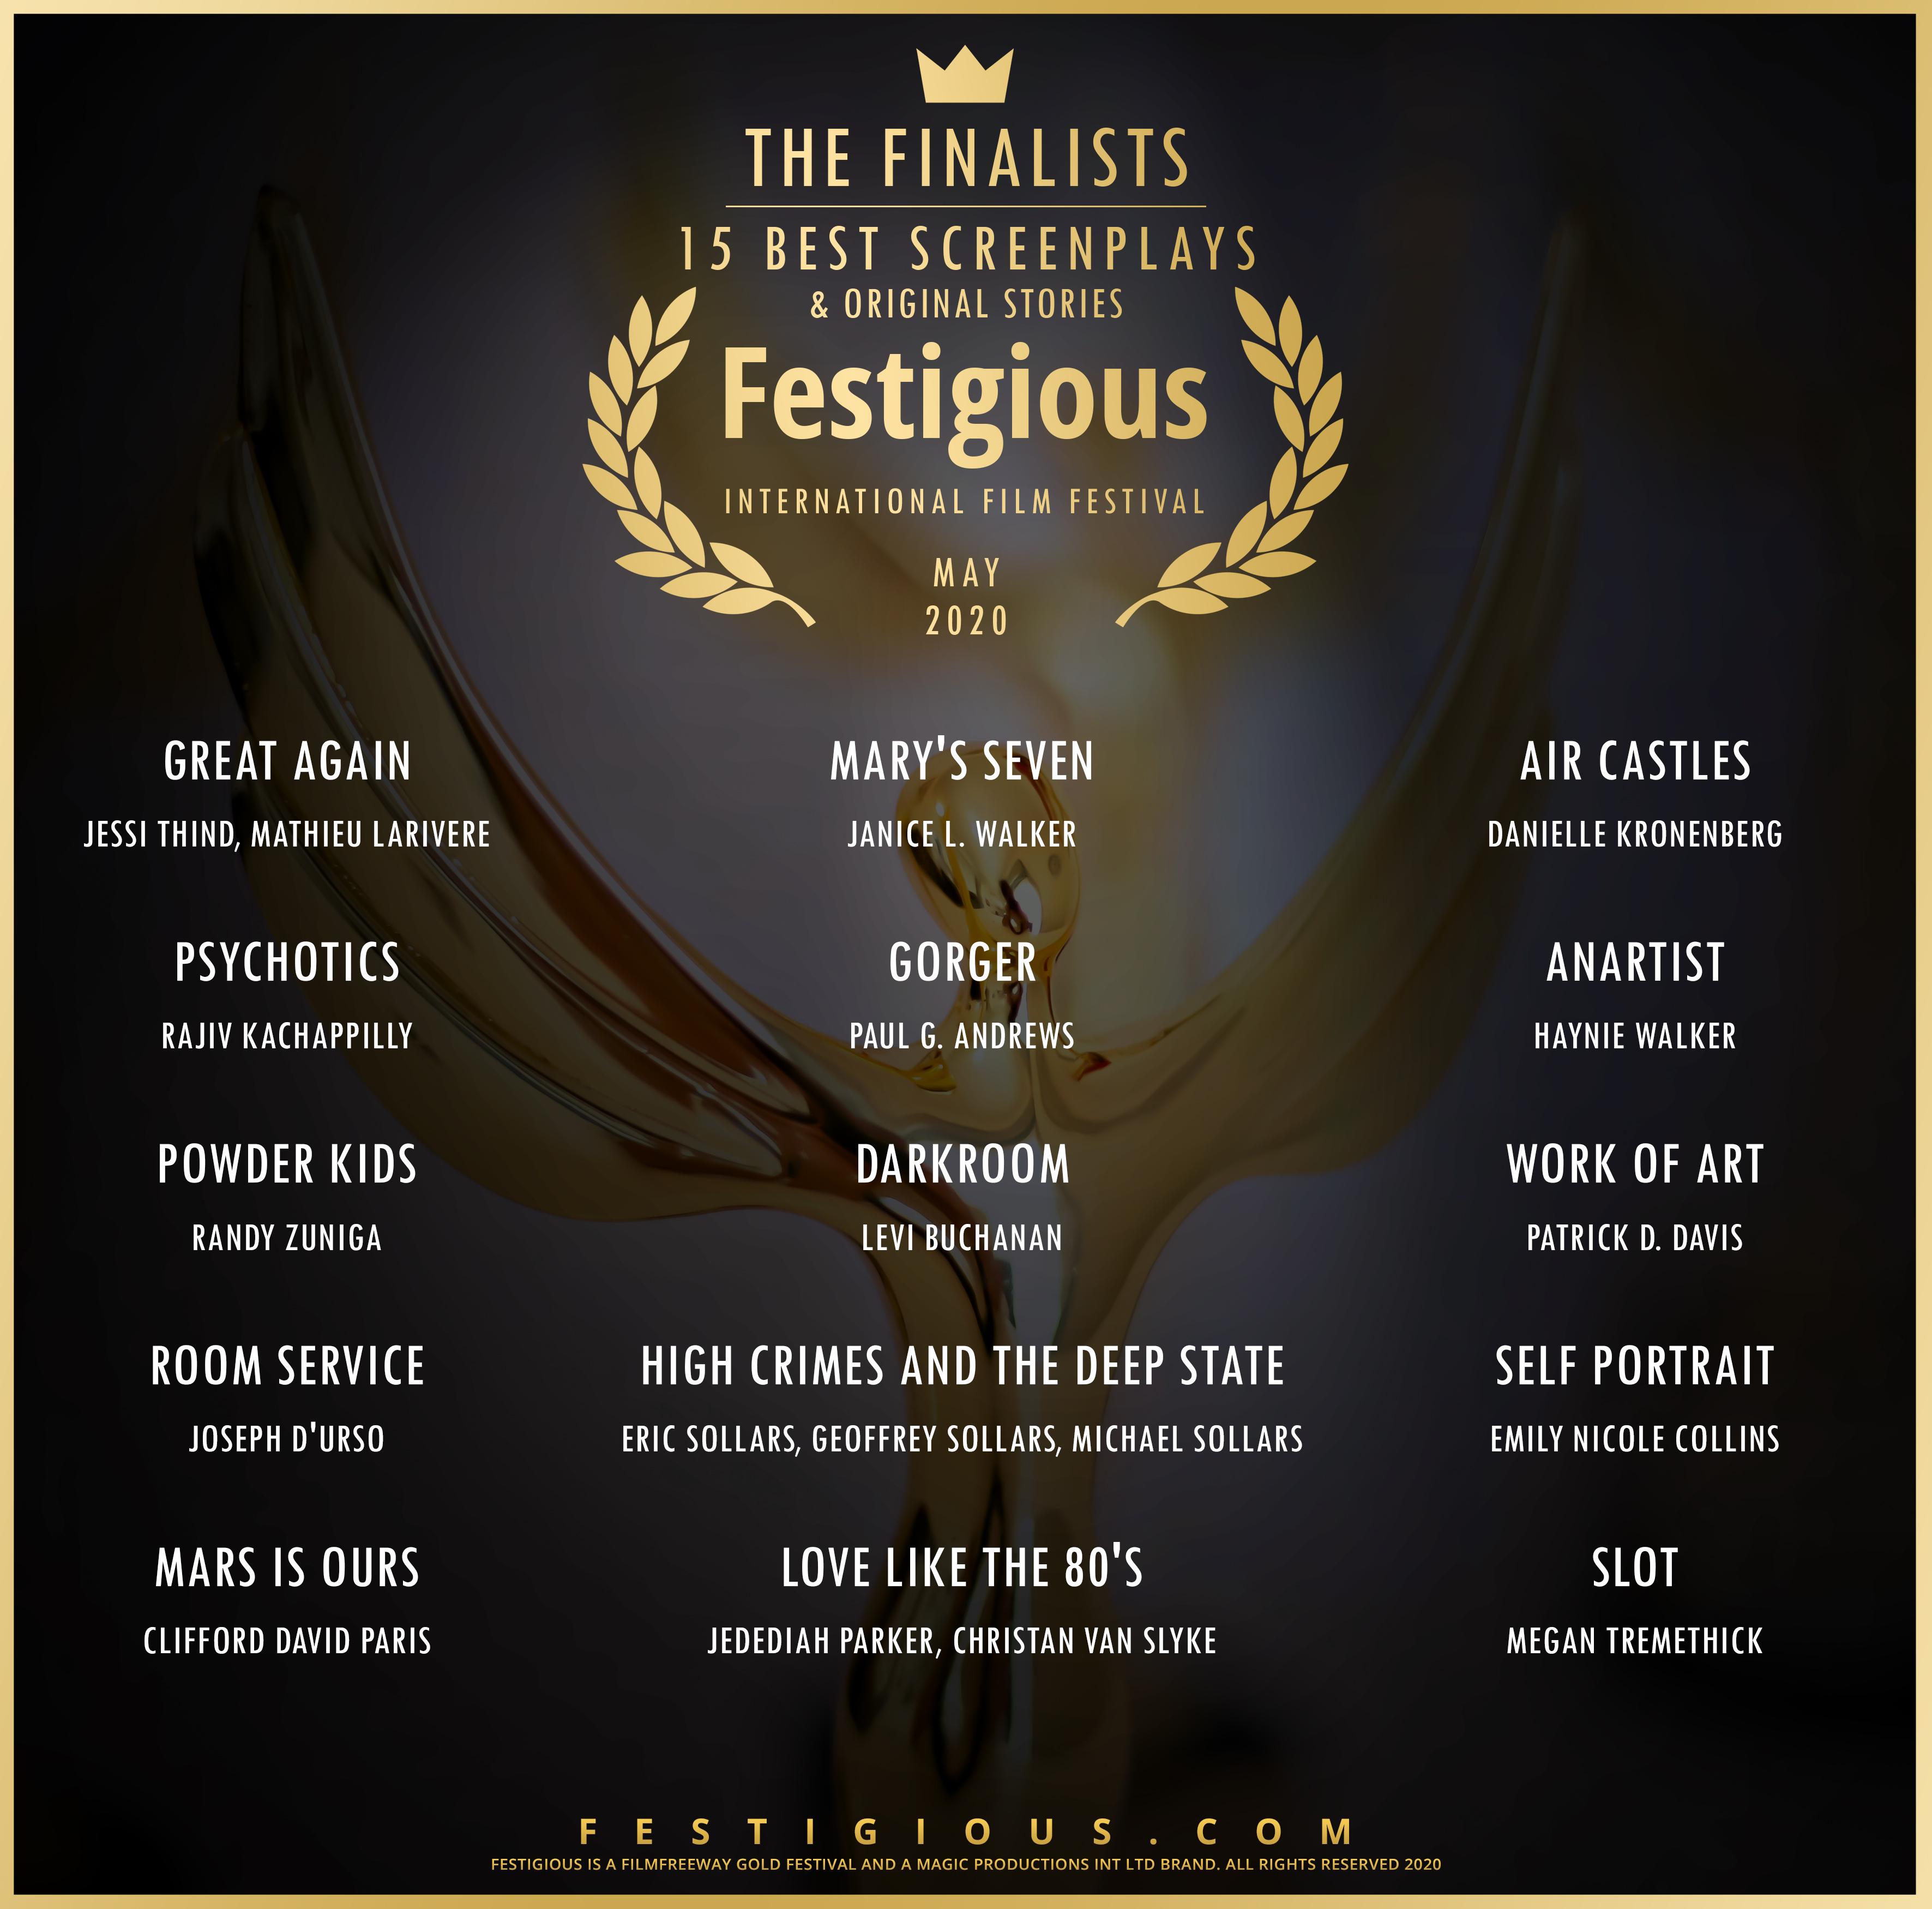 Festigious Screenplay Finalists 20